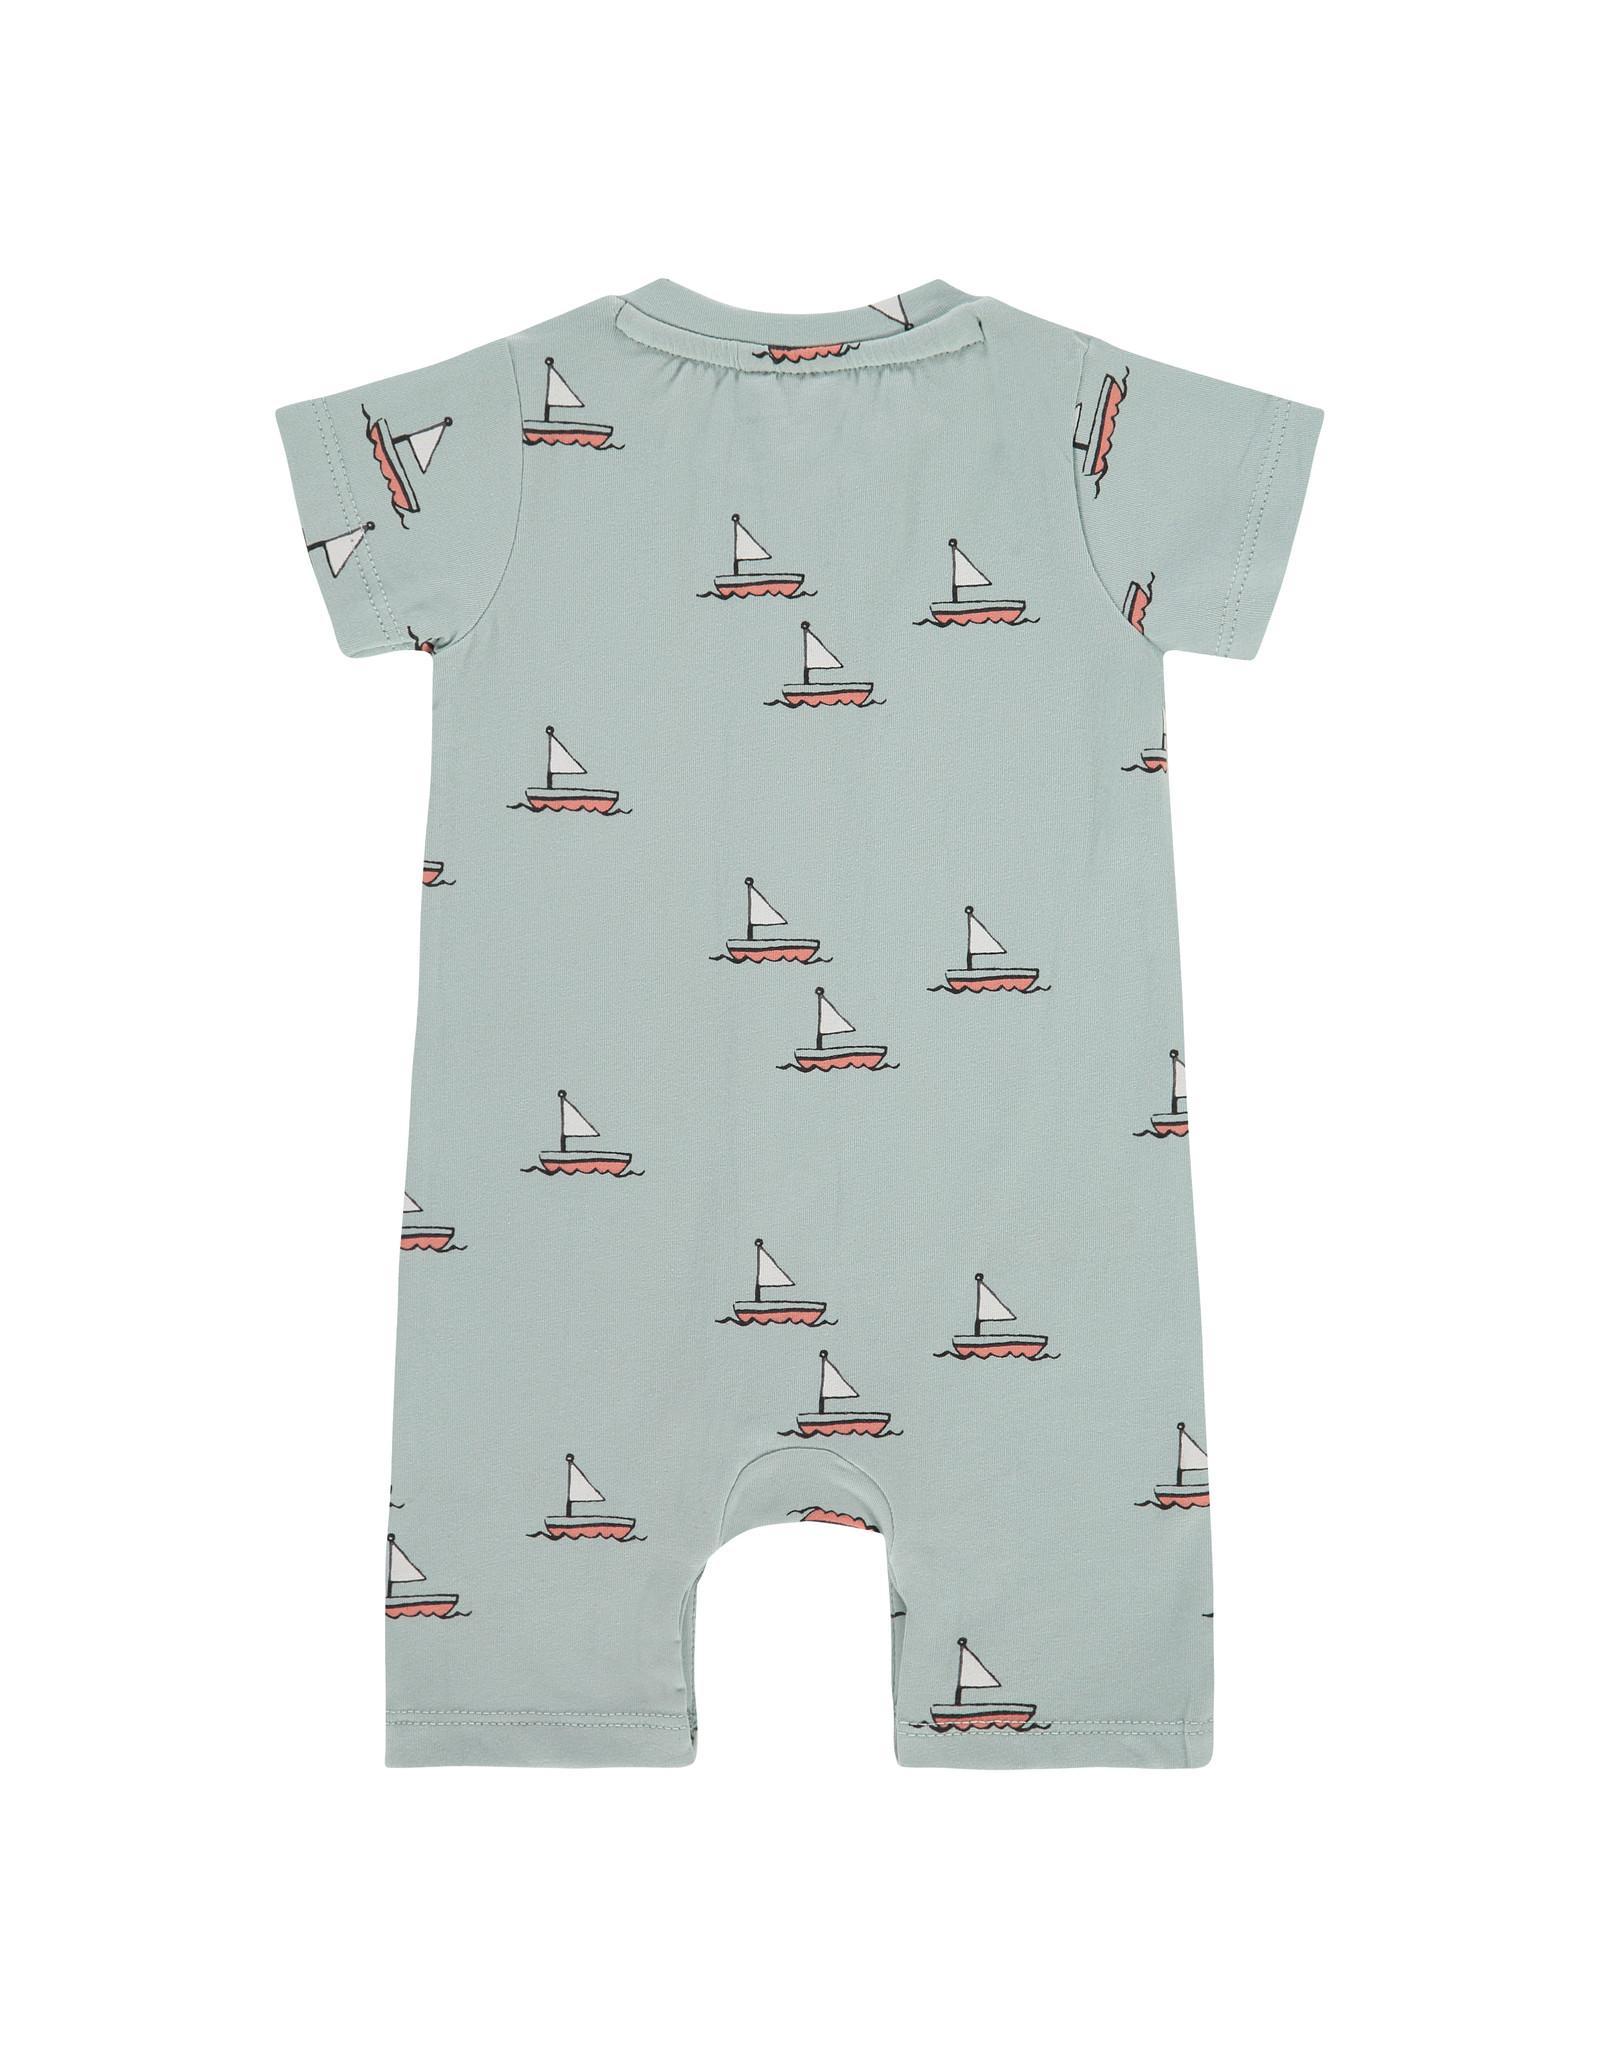 Babyface baby boys suit short sleeve, grey mint, NWB21227741